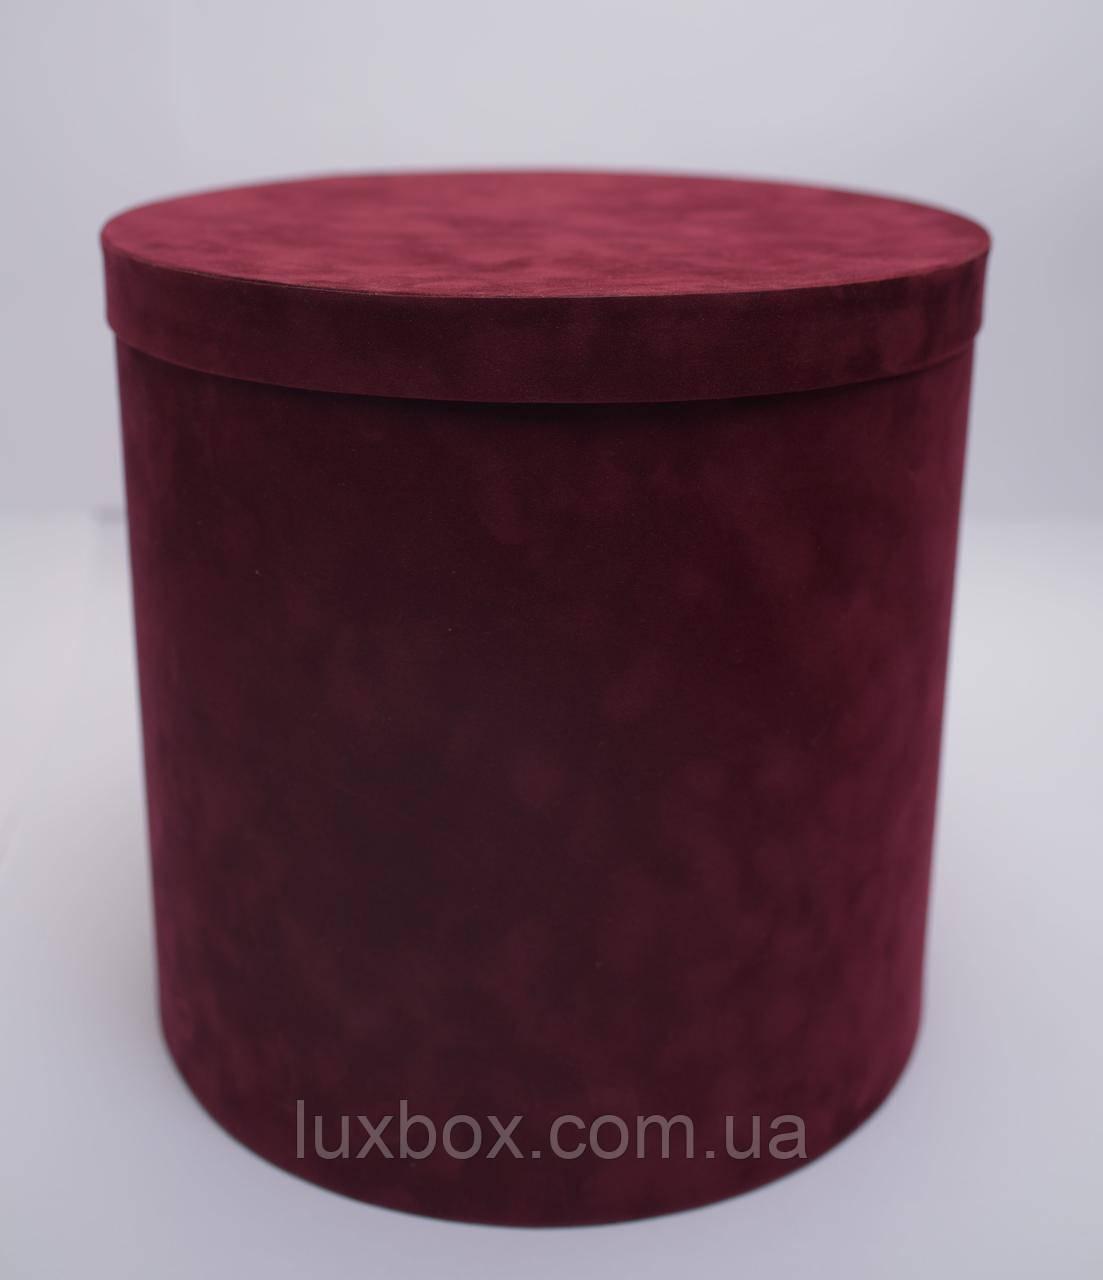 Шляпна коробка Велюрова(бархатна коробка) h30/d30